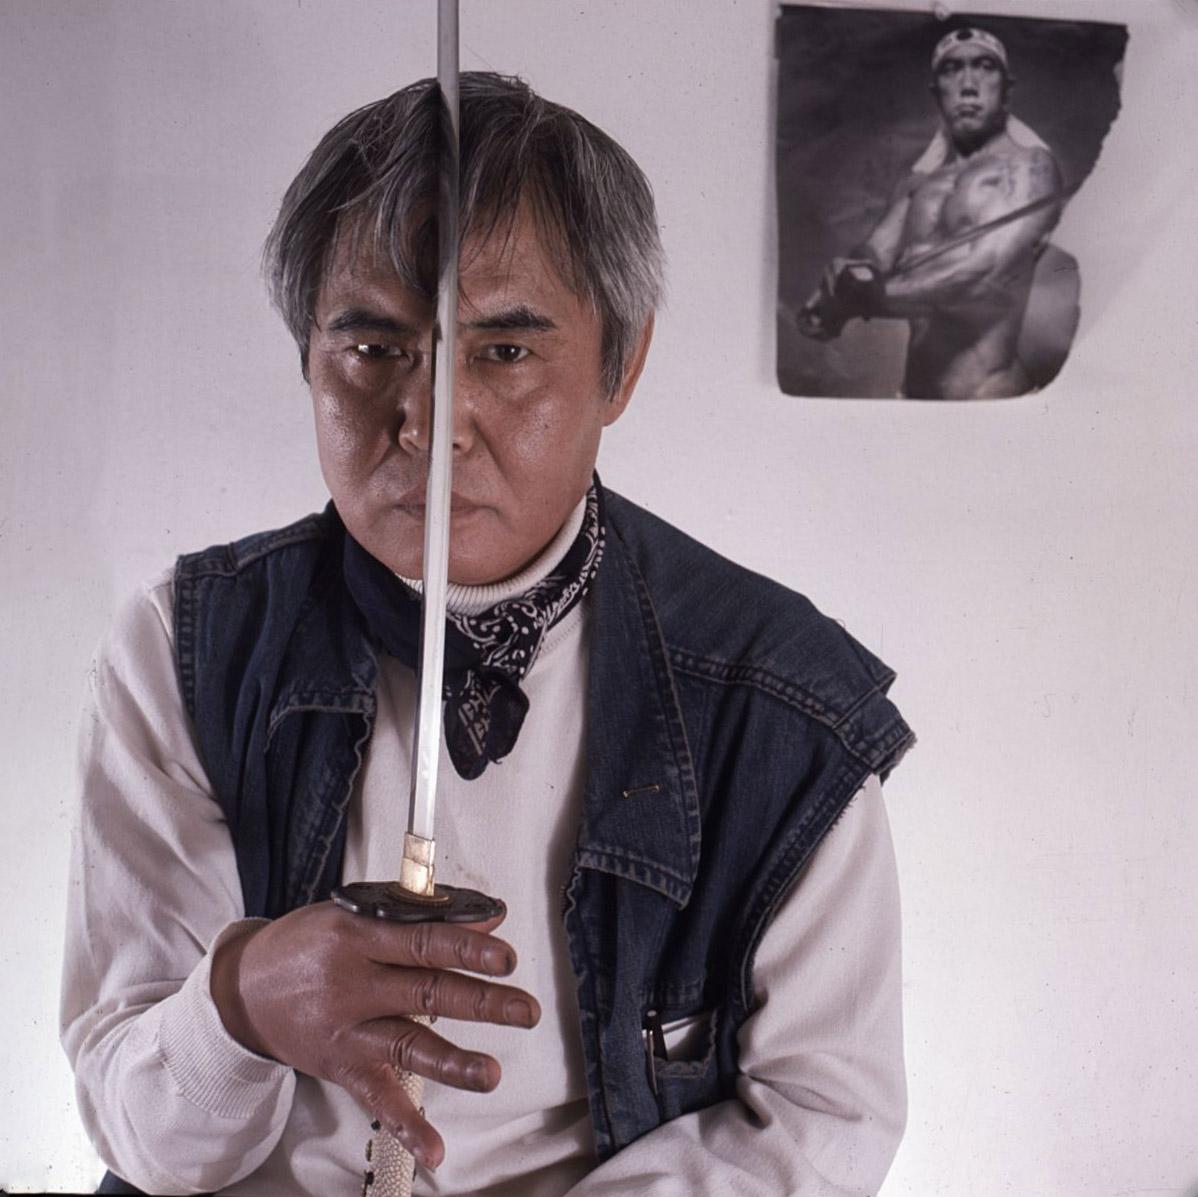 Kanemitsu posing with a sword, circa 1972.